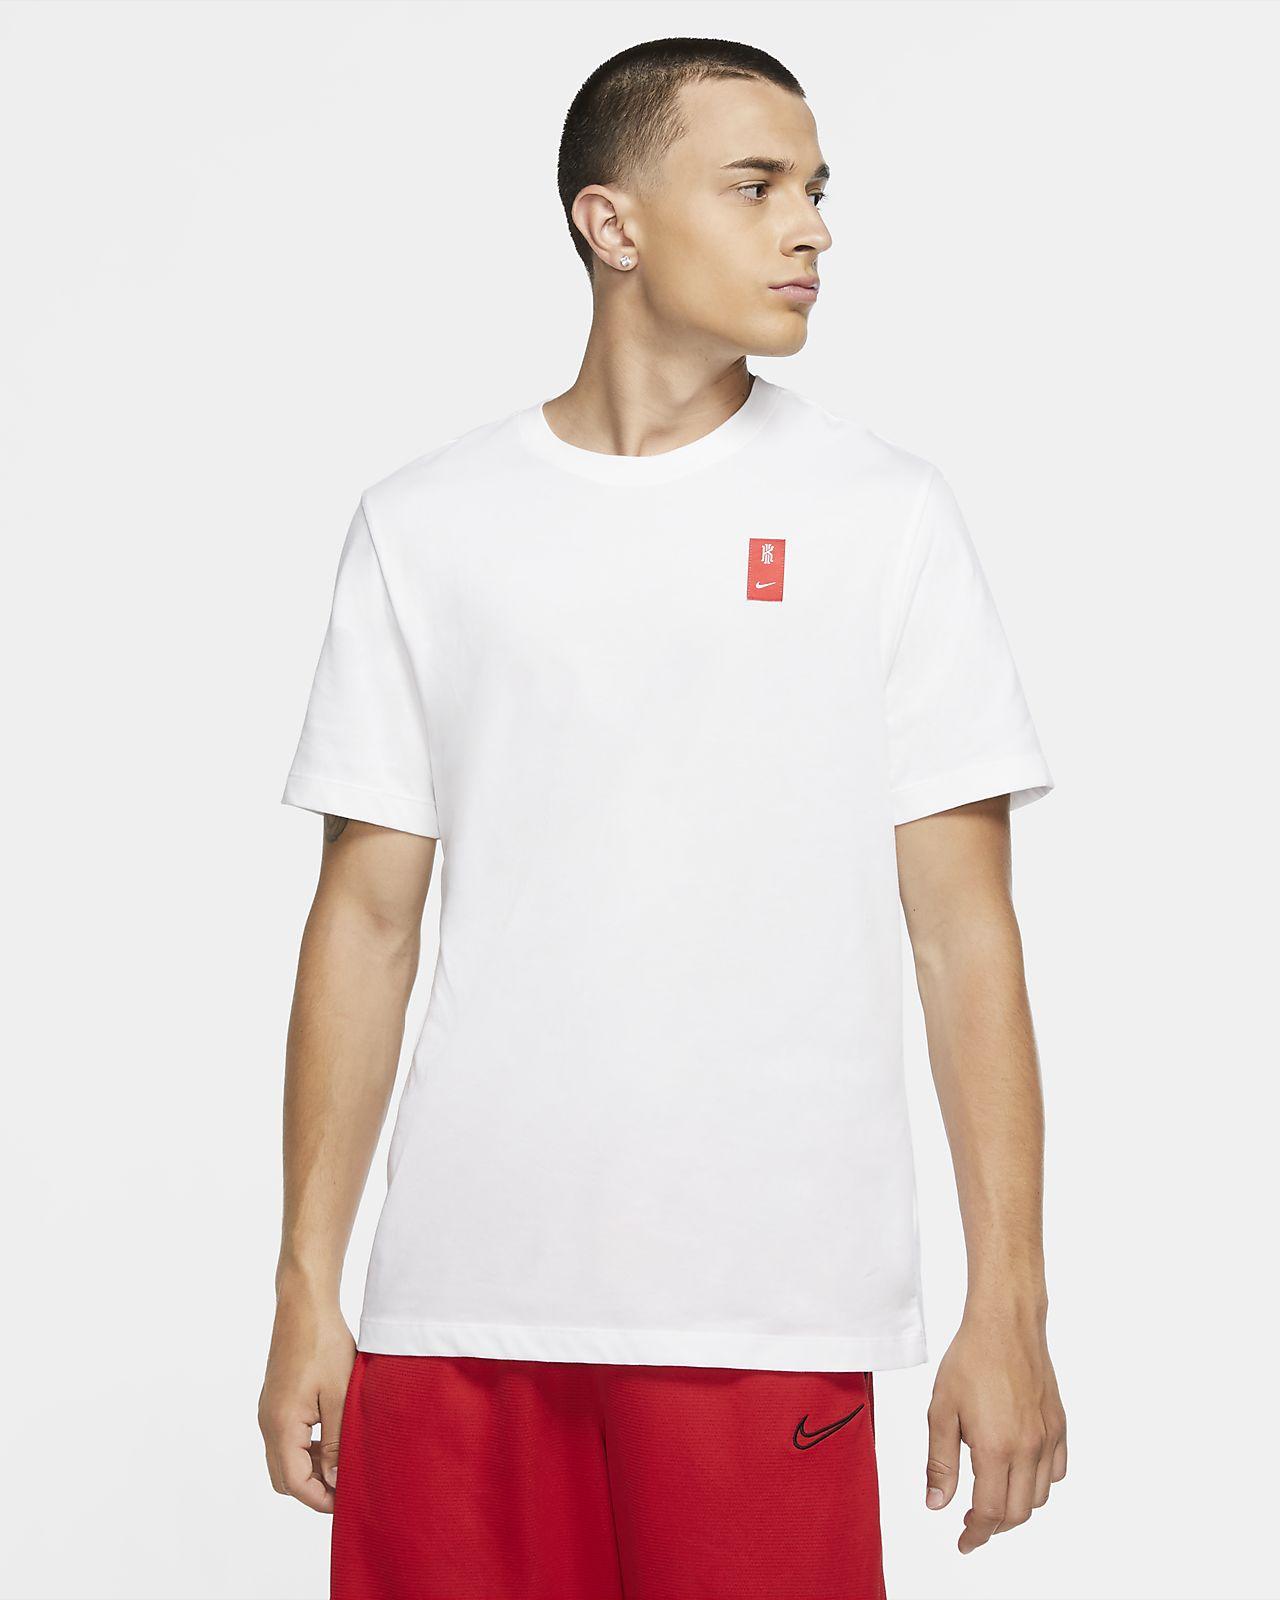 Playera de básquetbol para hombre Nike Dri-FIT Kyrie Logo